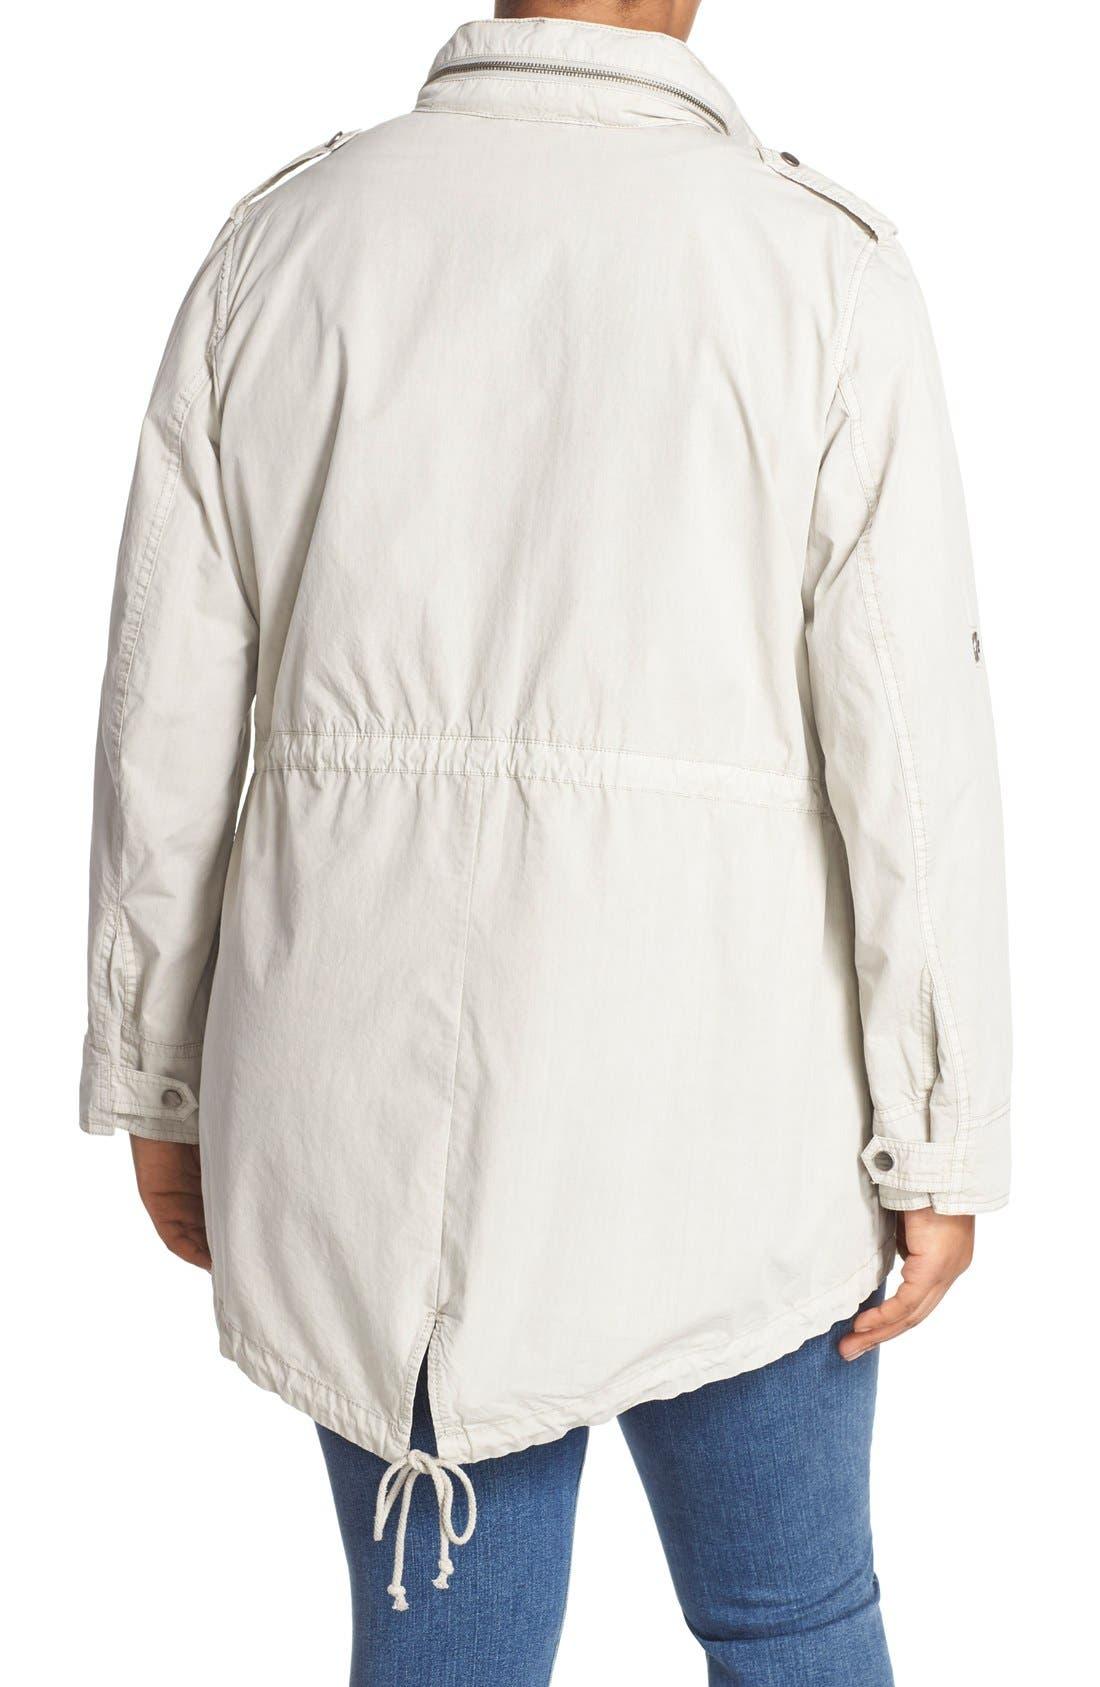 Parachute Hooded Cotton Utility Jacket,                             Alternate thumbnail 2, color,                             Moonbeam